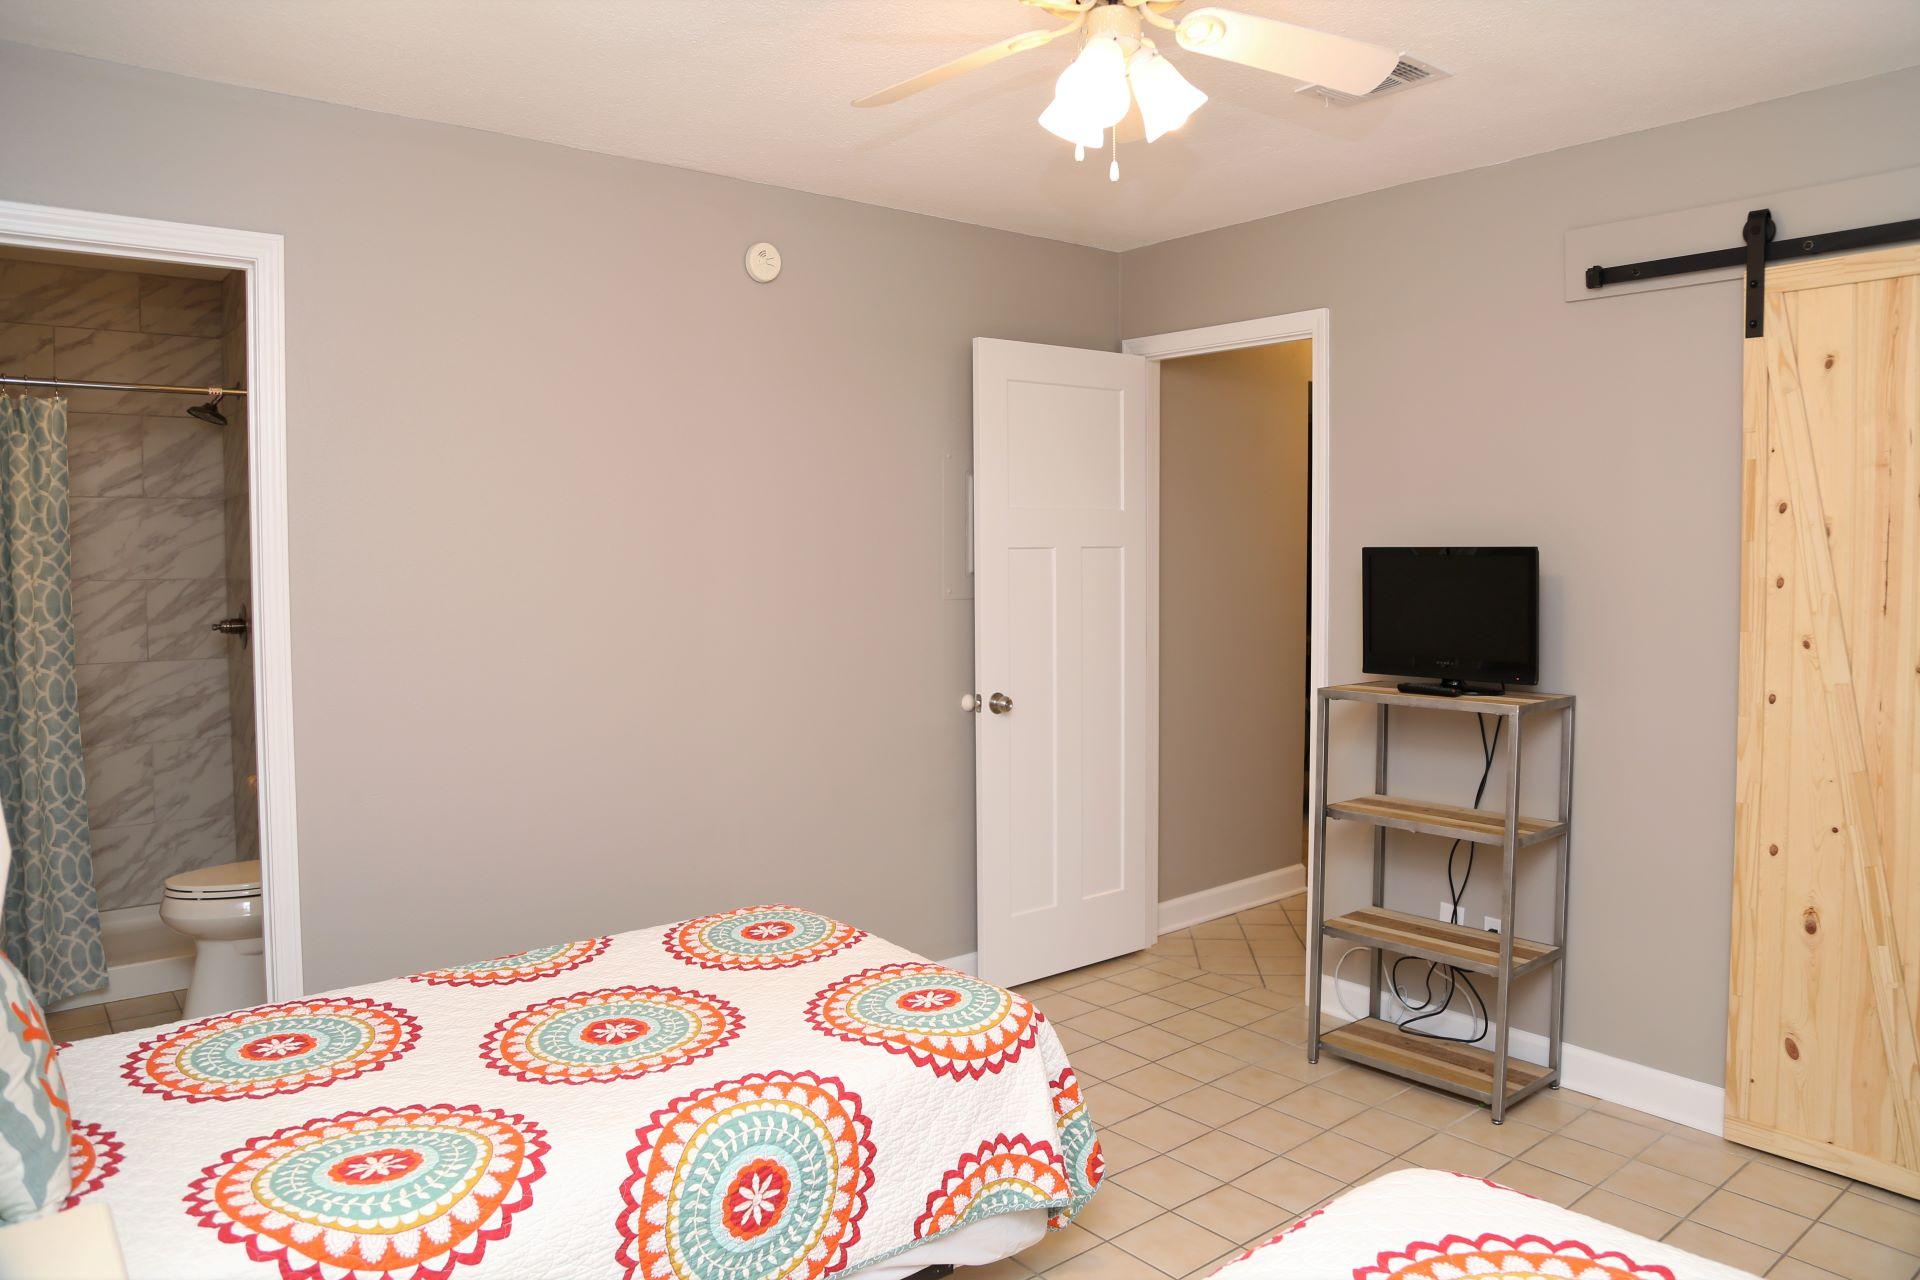 The second bedroom includes an en-suite bathroom.